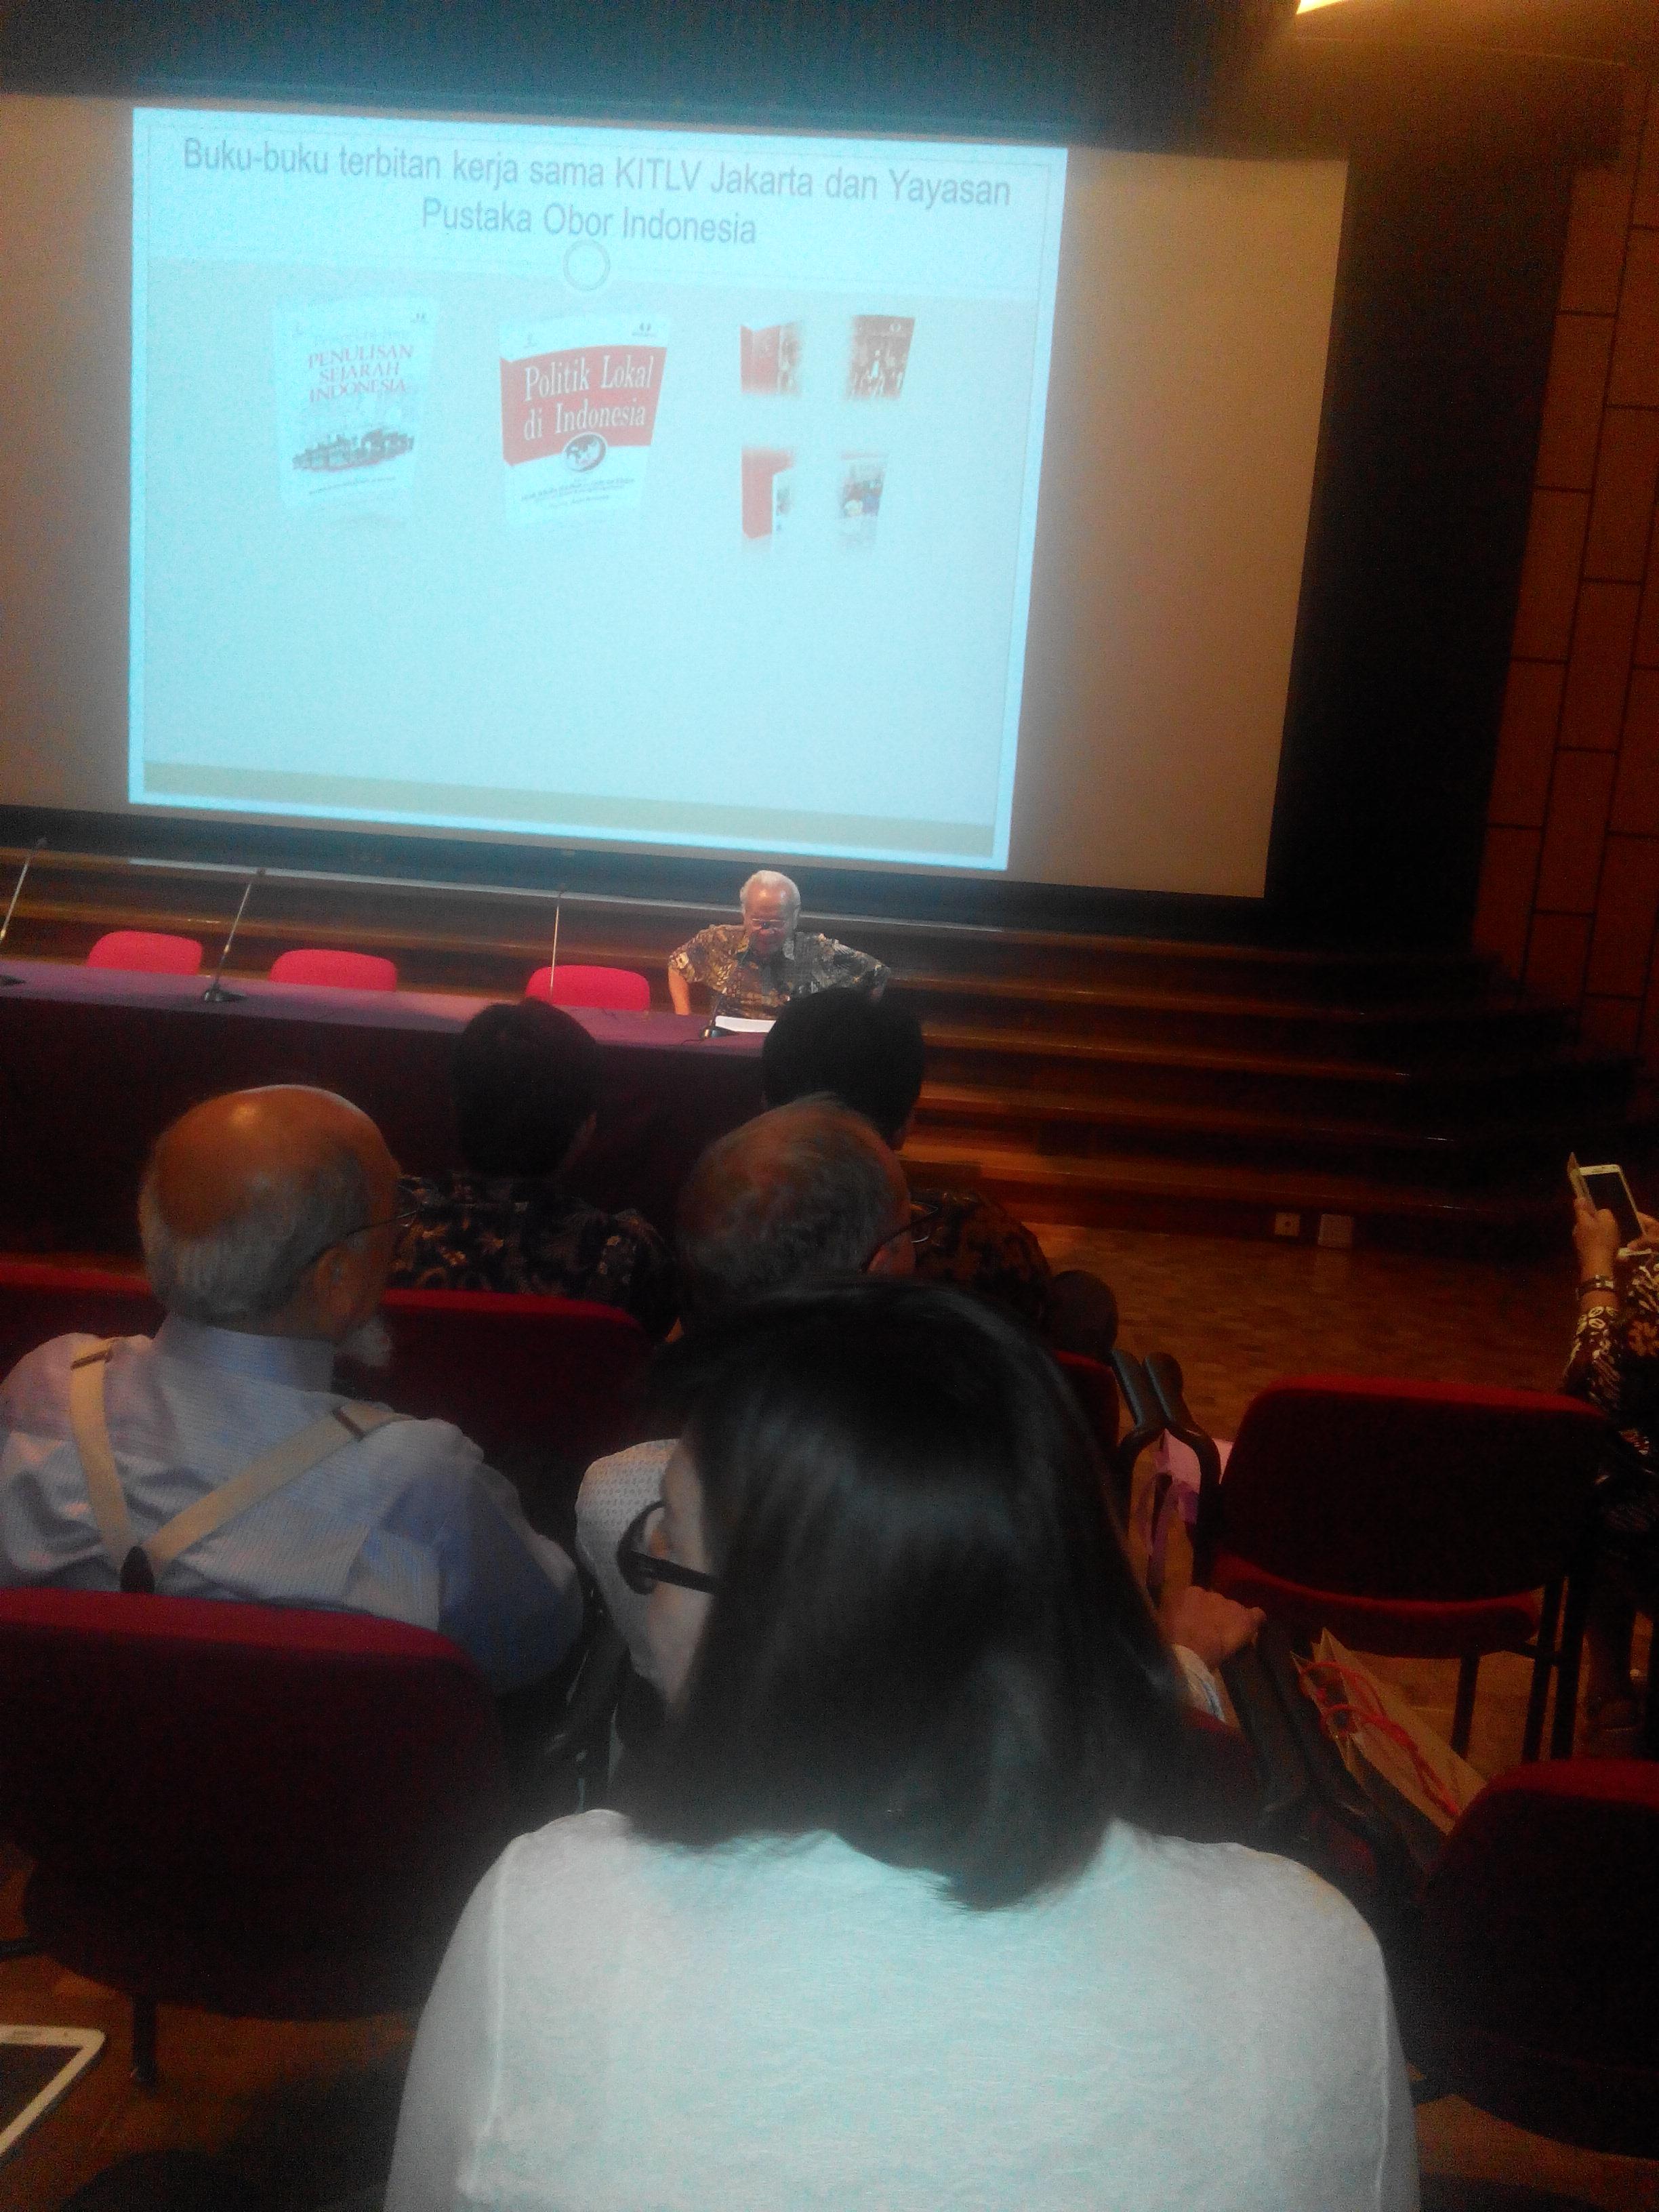 Suasana Diskusi Buku (Foto Dasman Djamaluddin)